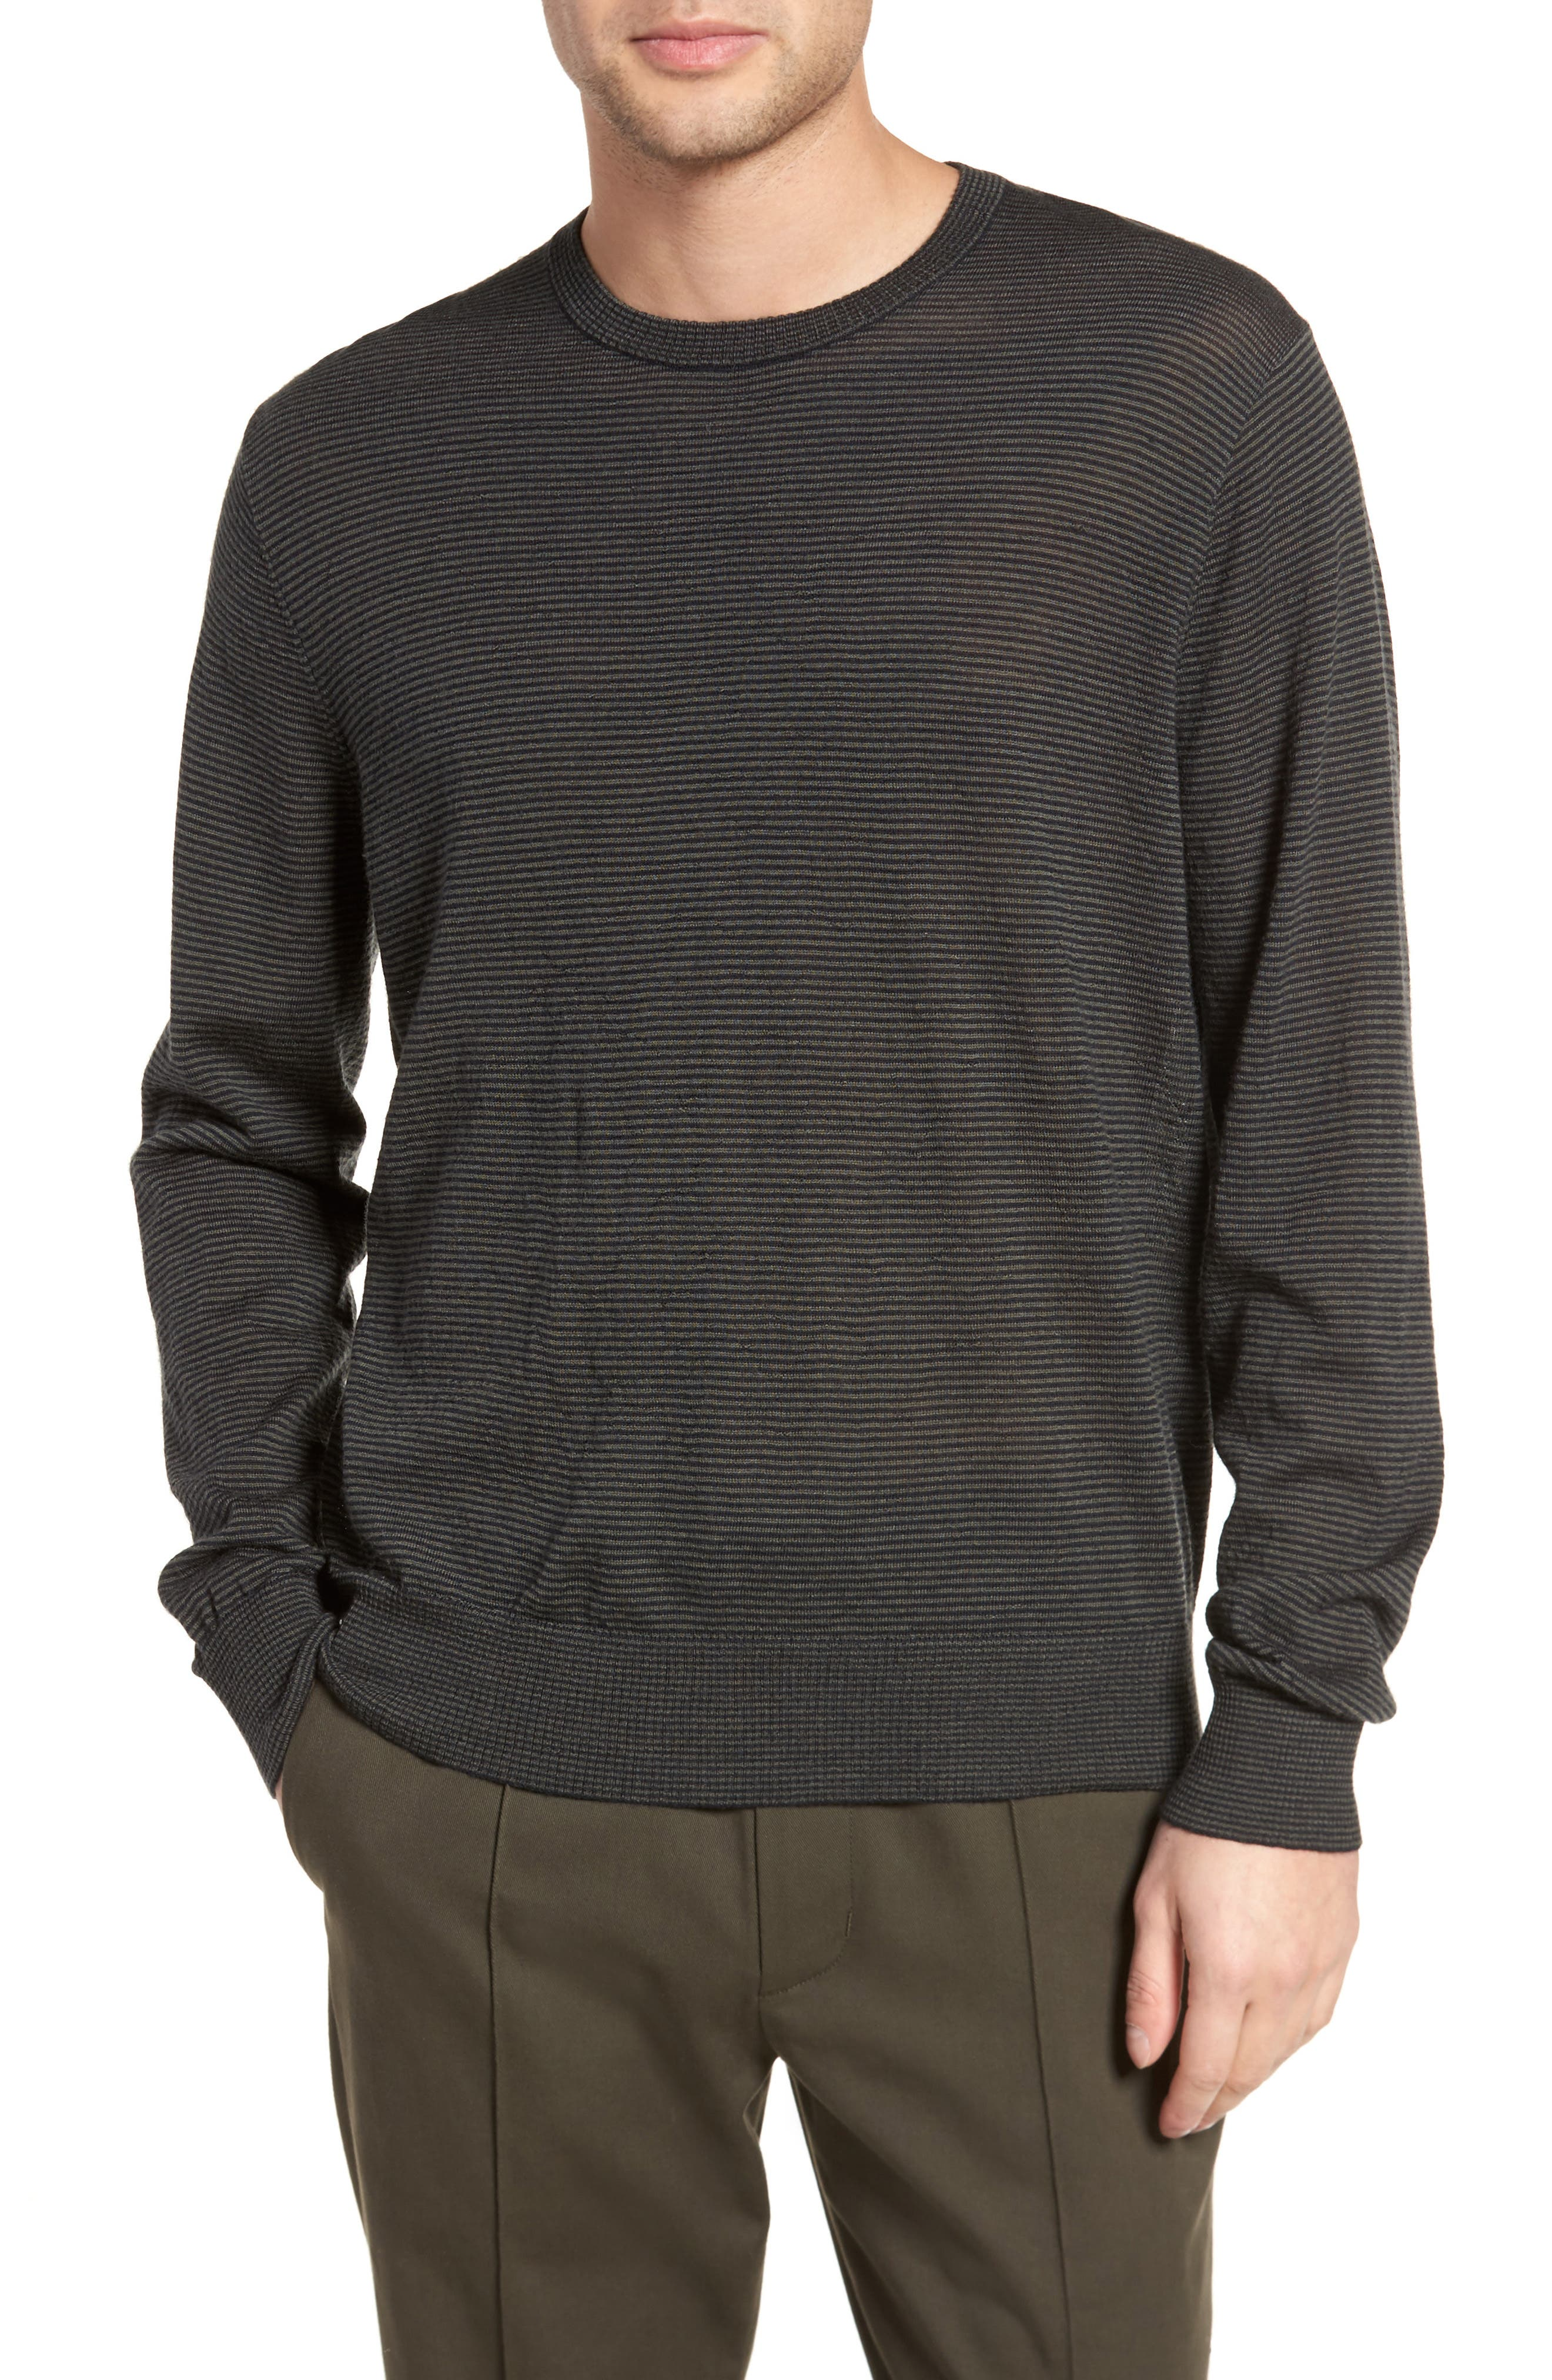 Regular Fit Pinstripe Wool Sweater,                             Main thumbnail 1, color,                             New Coastal/ H Charcoal